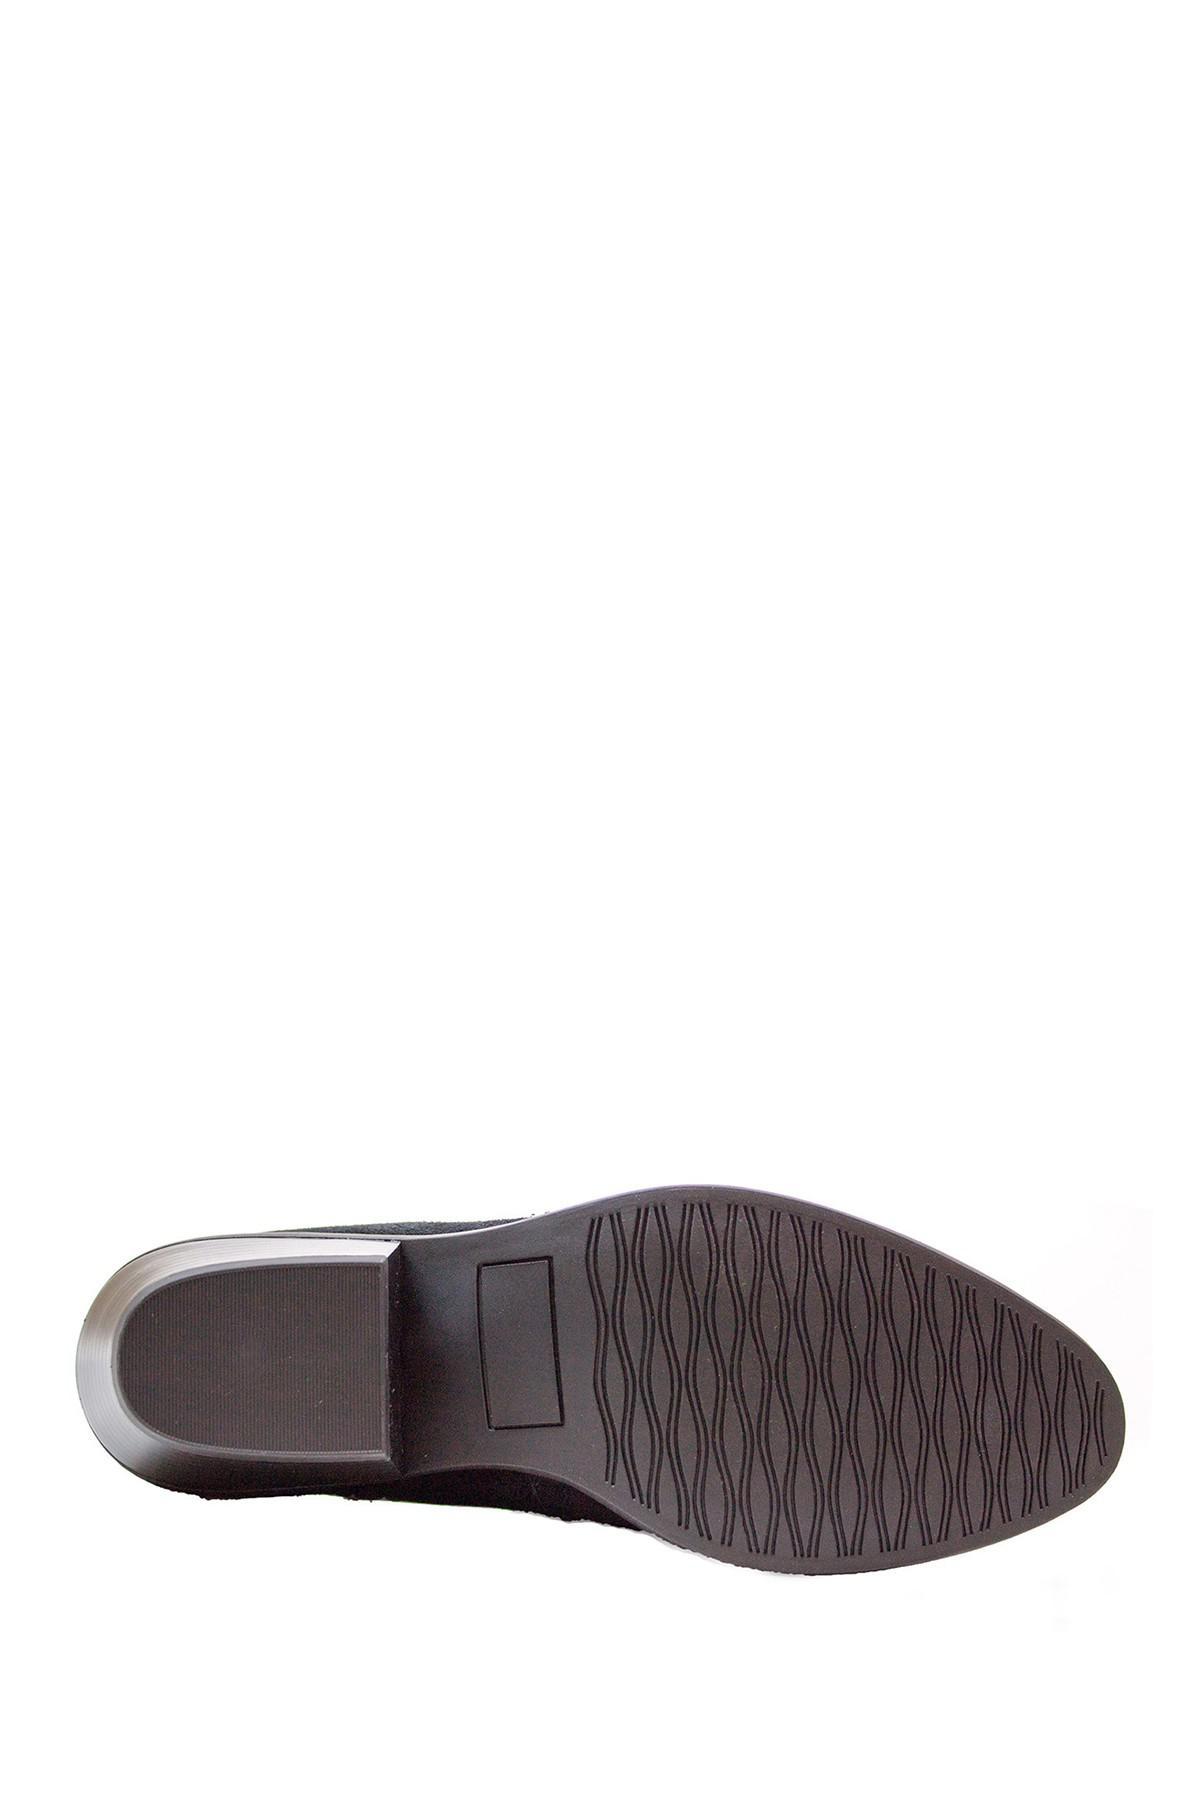 b9fc100e5f07 Lyst - White Mountain Footwear Sadie Ankle Bootie in Black